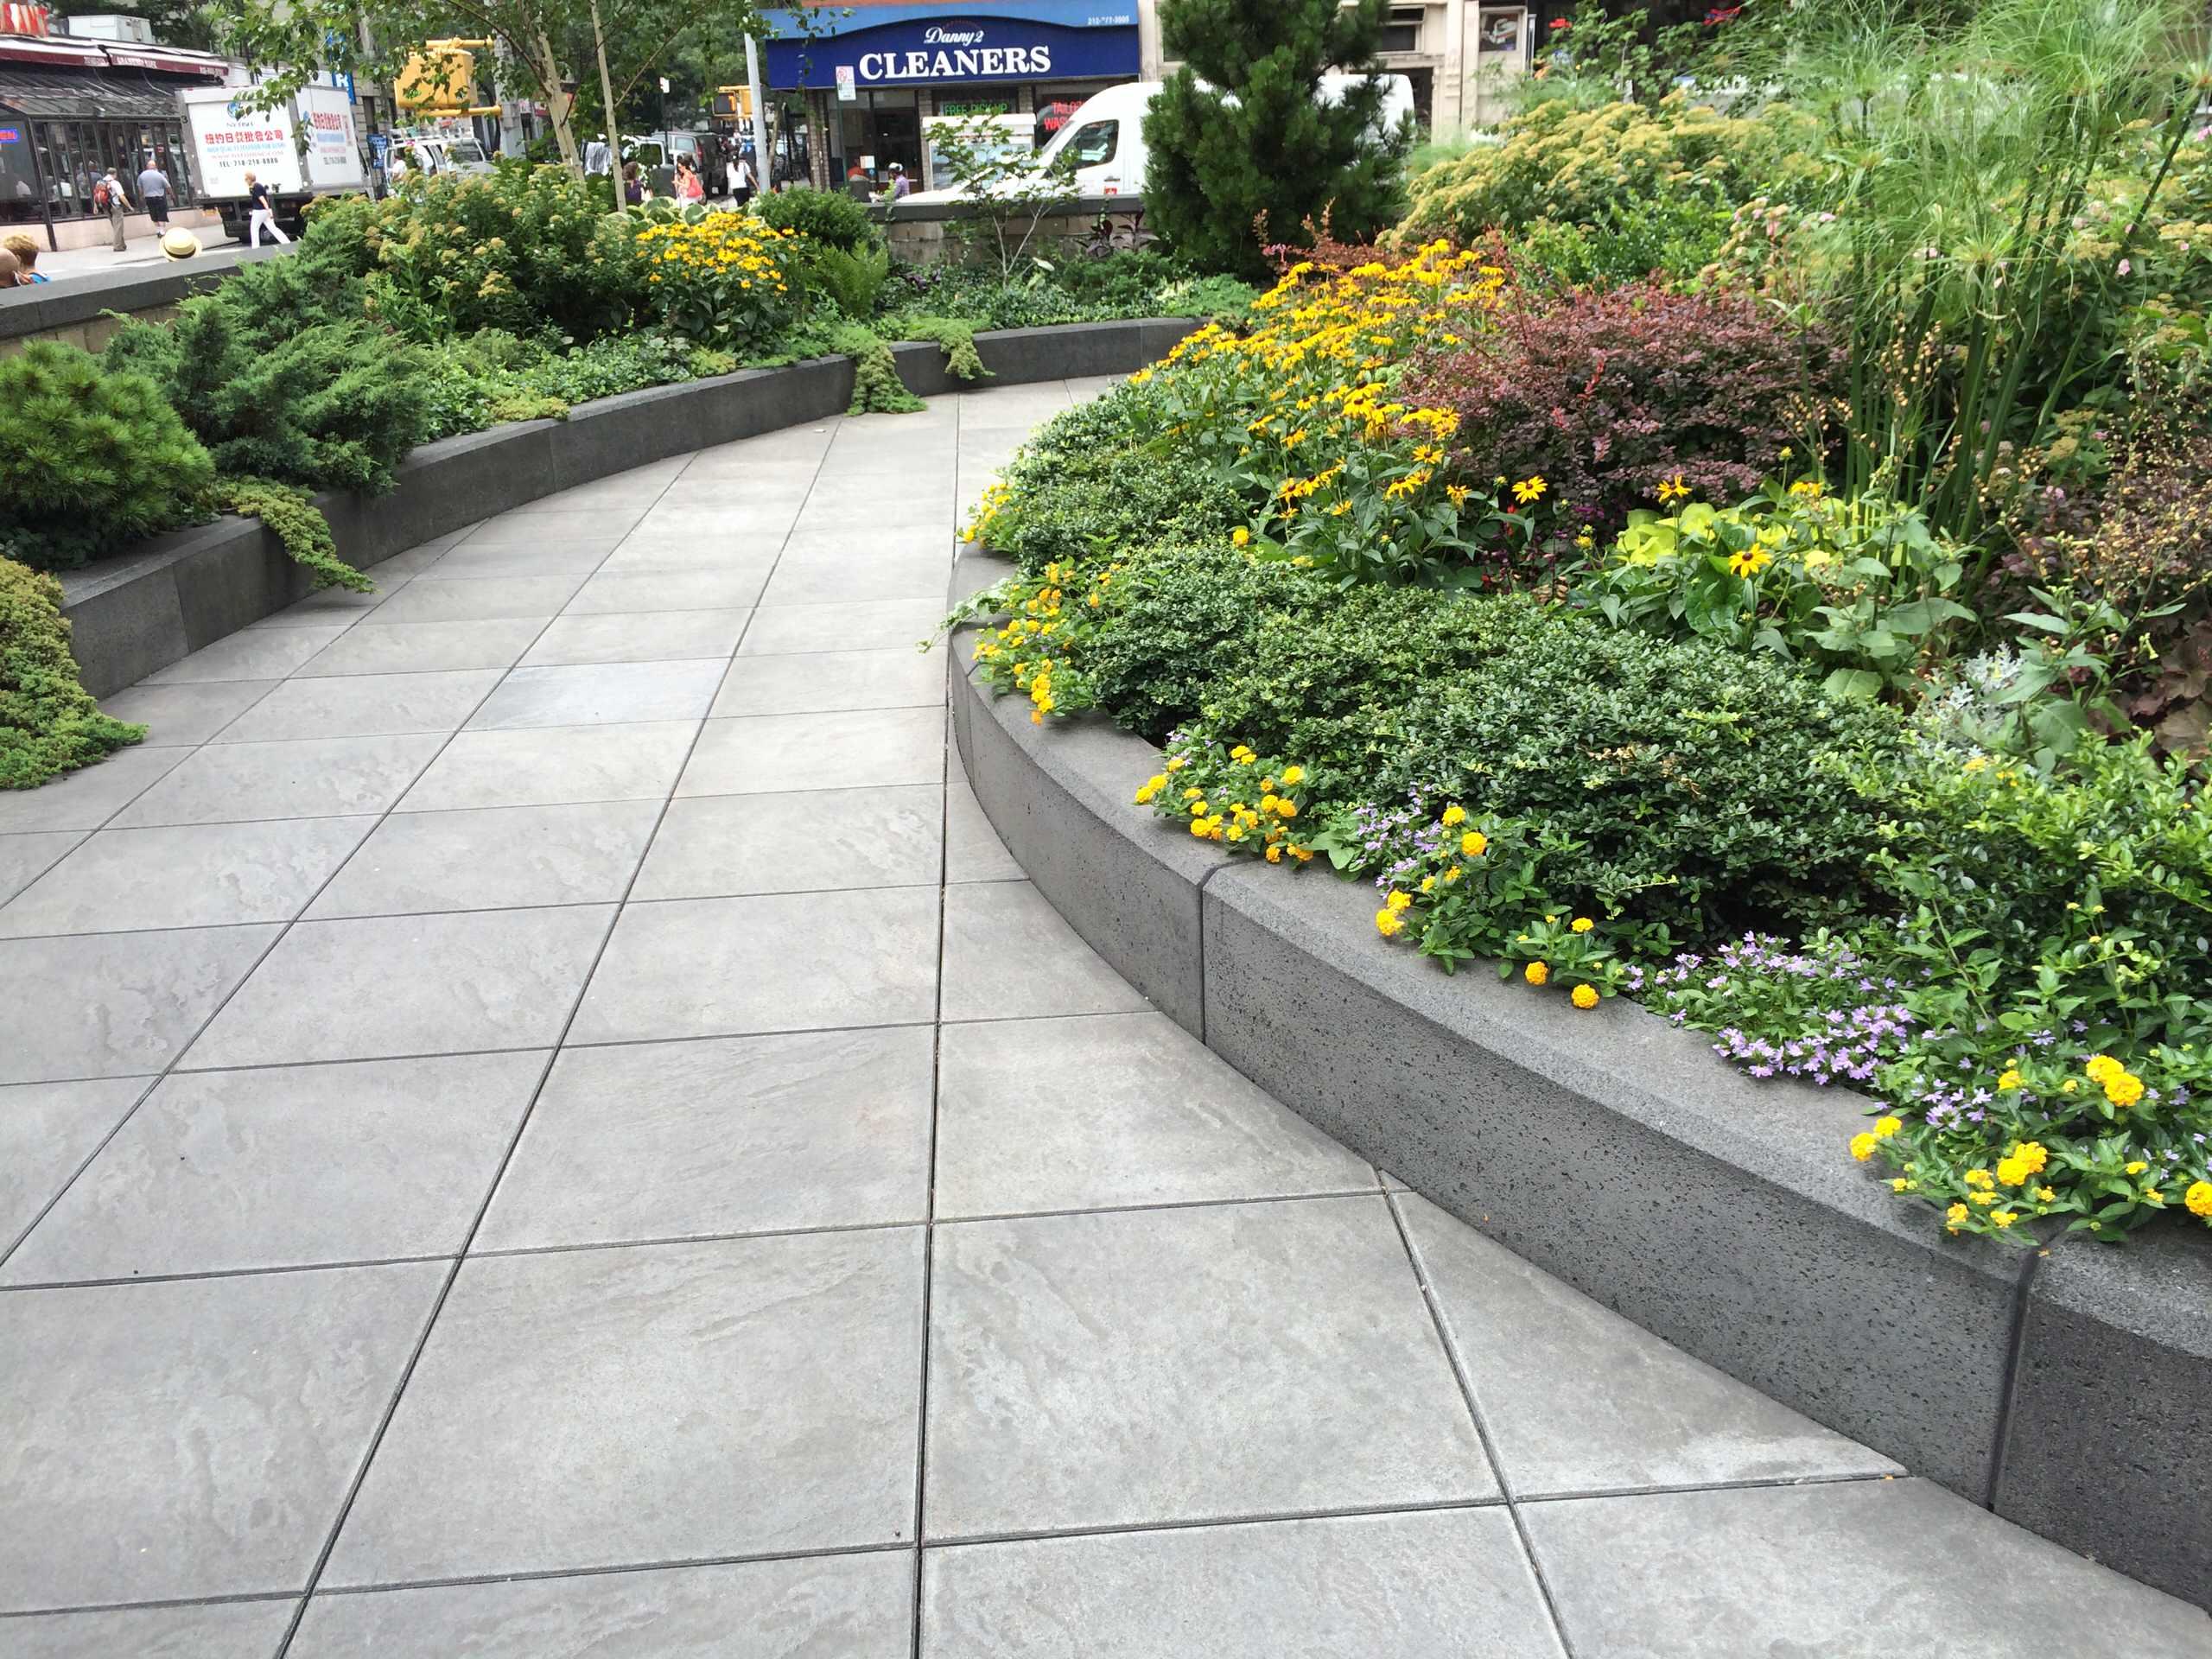 East Side Plaza